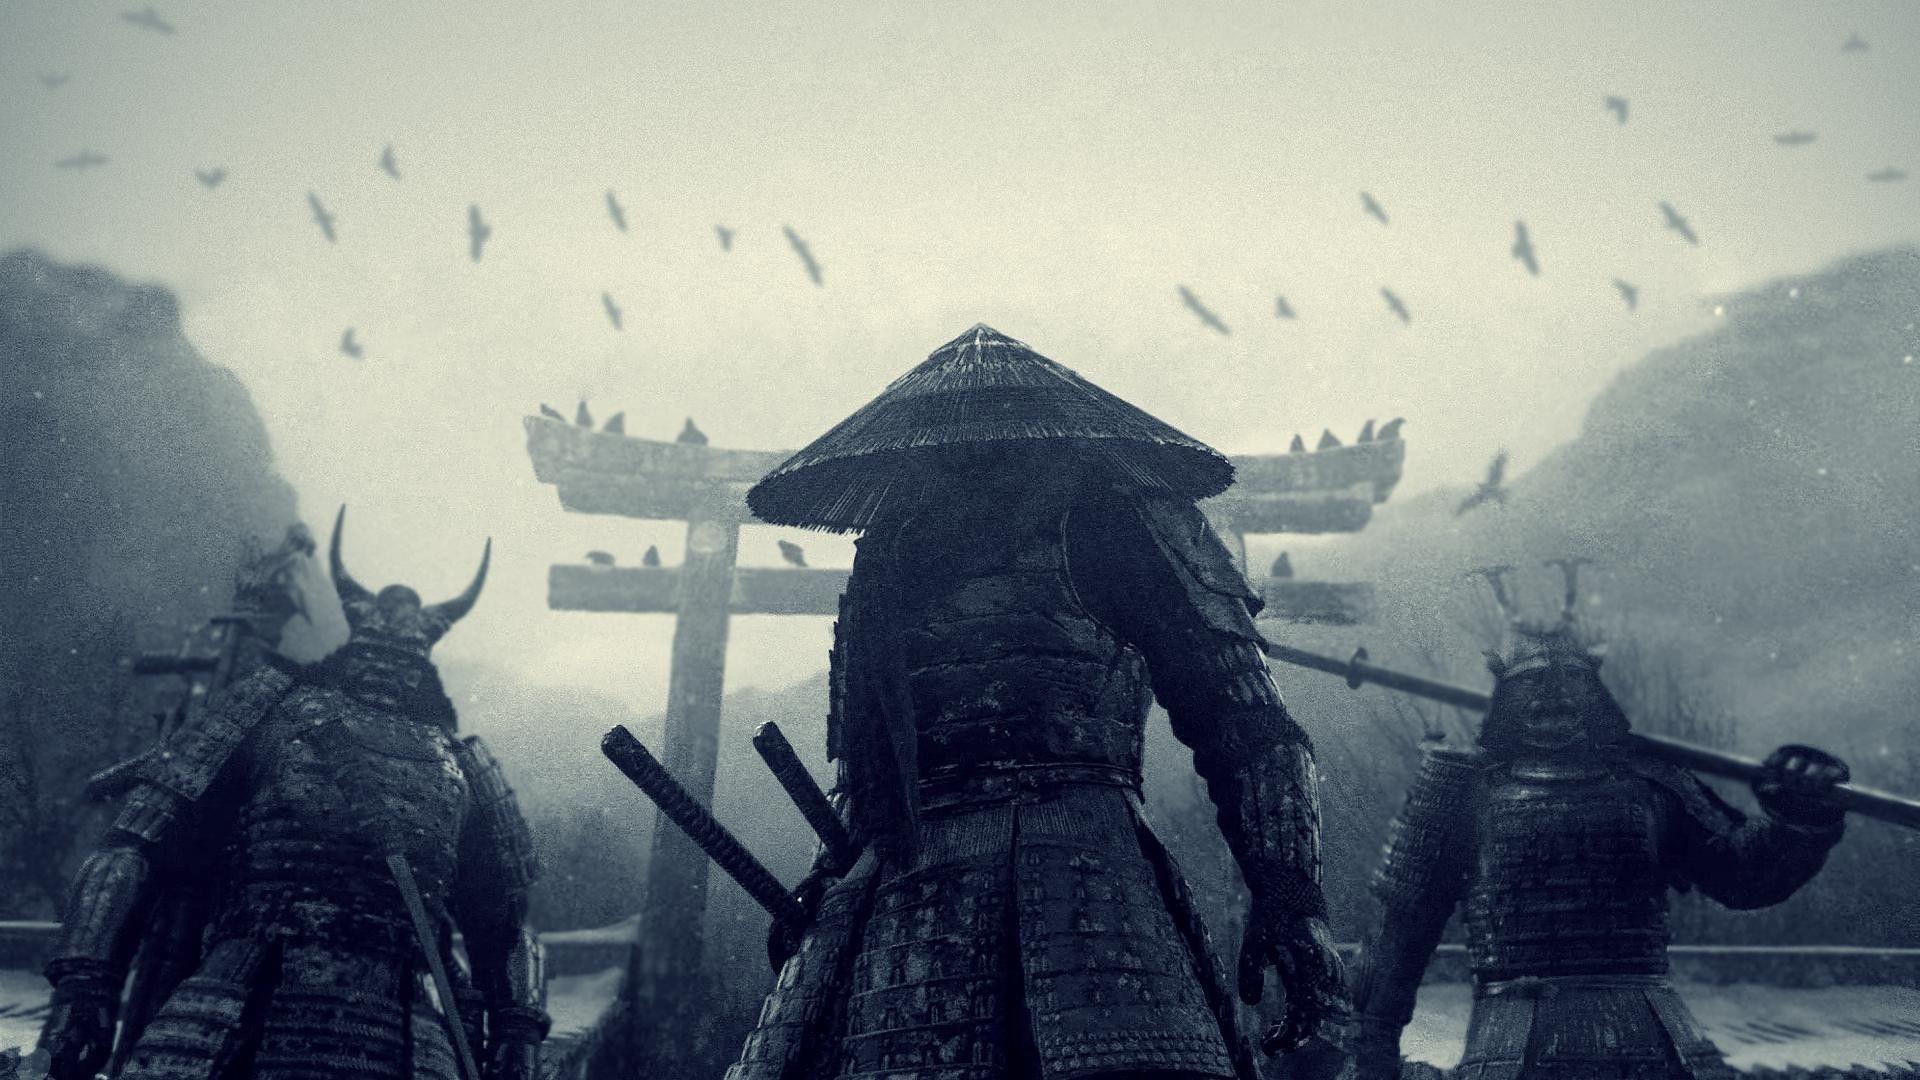 Res: 1920x1080,  Wallpapers For > Ancient Samurai Wallpaper Hd